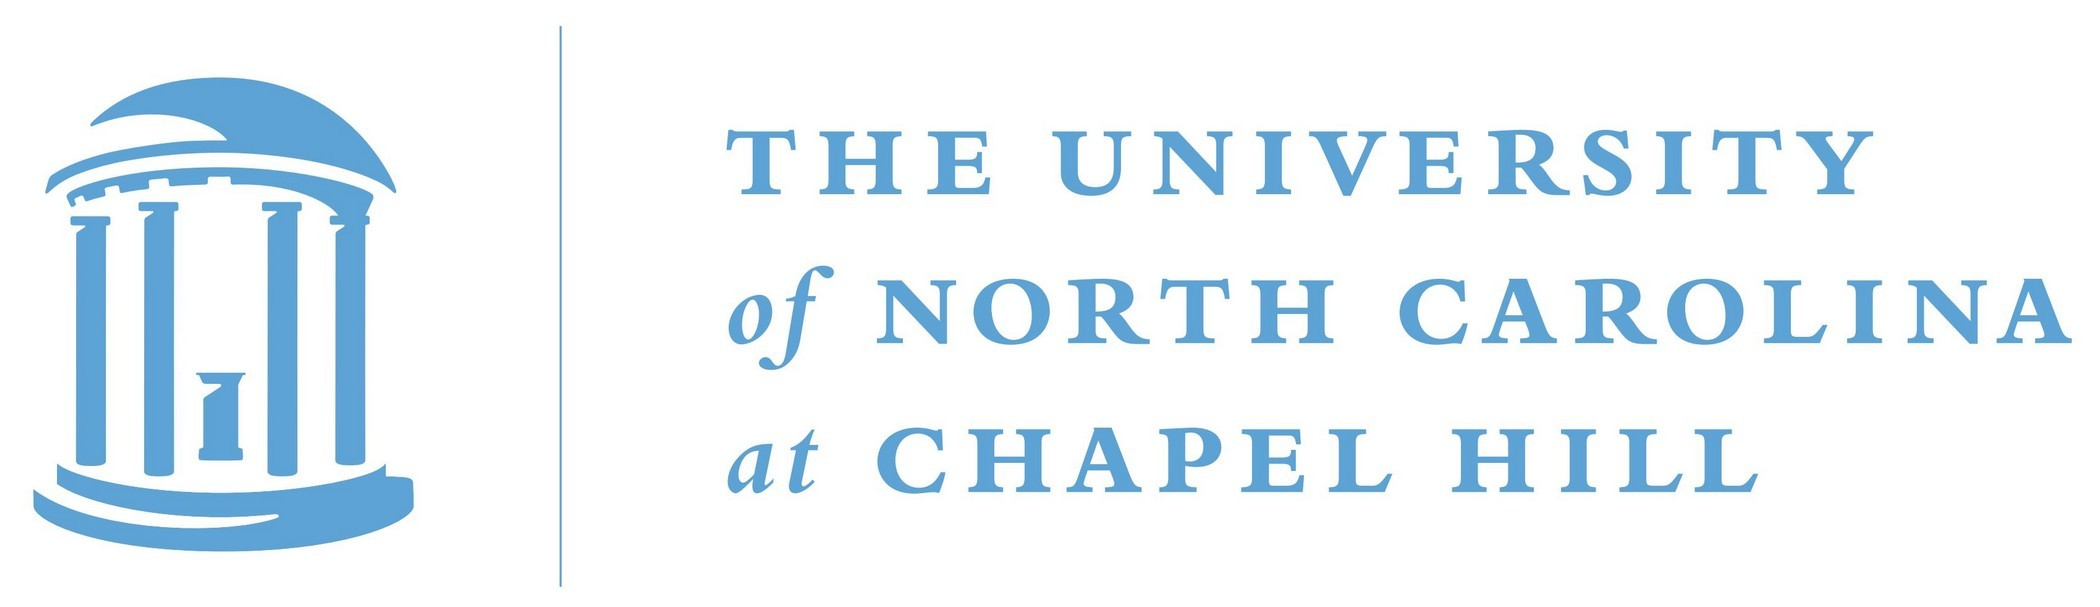 UNC_Logo_University_of_North_Carolina_at_Chapel_Hill_Logo